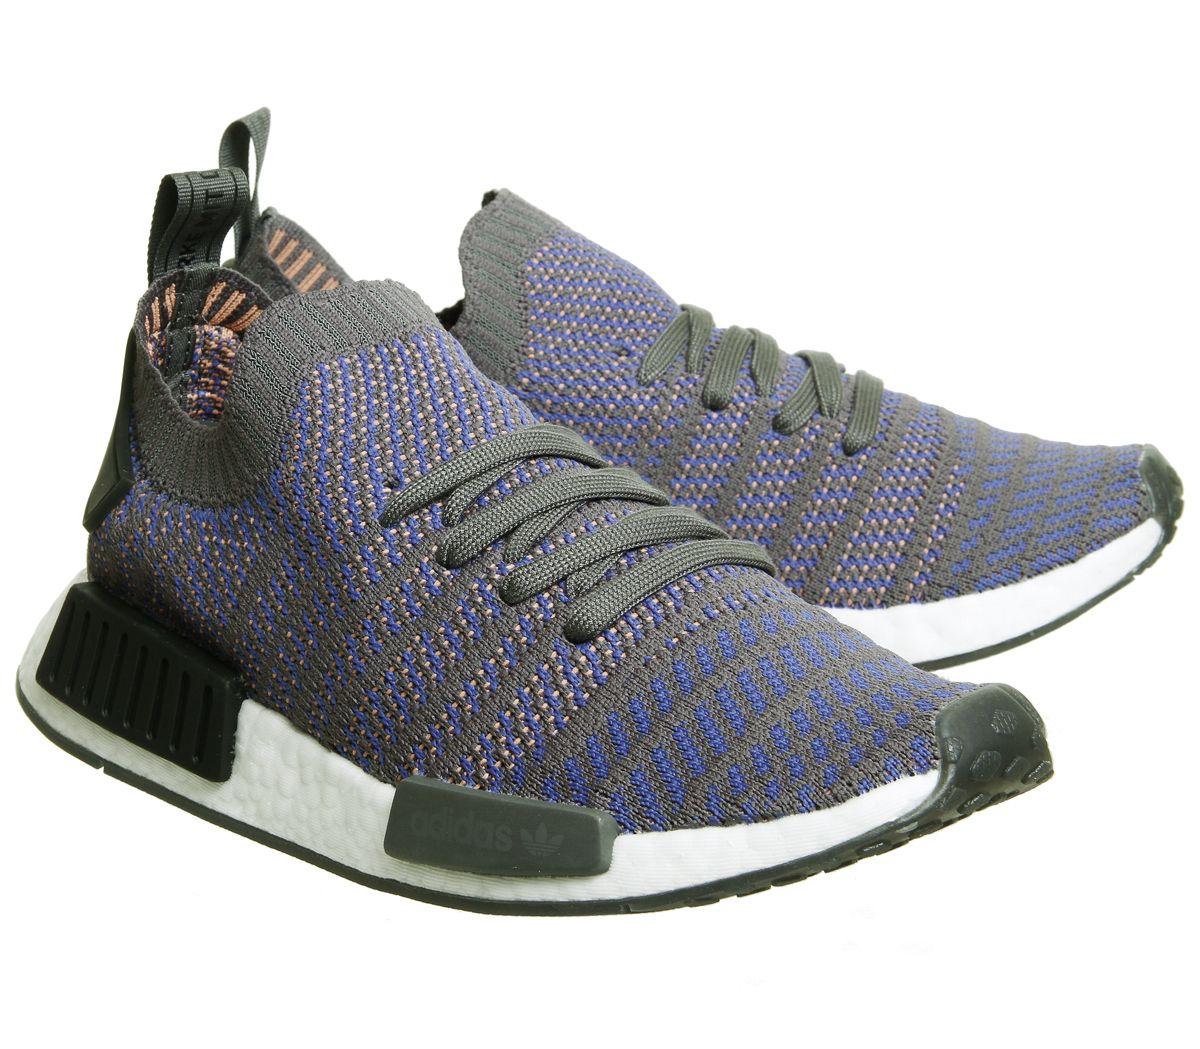 online retailer 62d5d bc249 Sentinel Adidas Nmd R1 Prime Knit Trainers Hi Res Blue Black White Trainers  Shoes